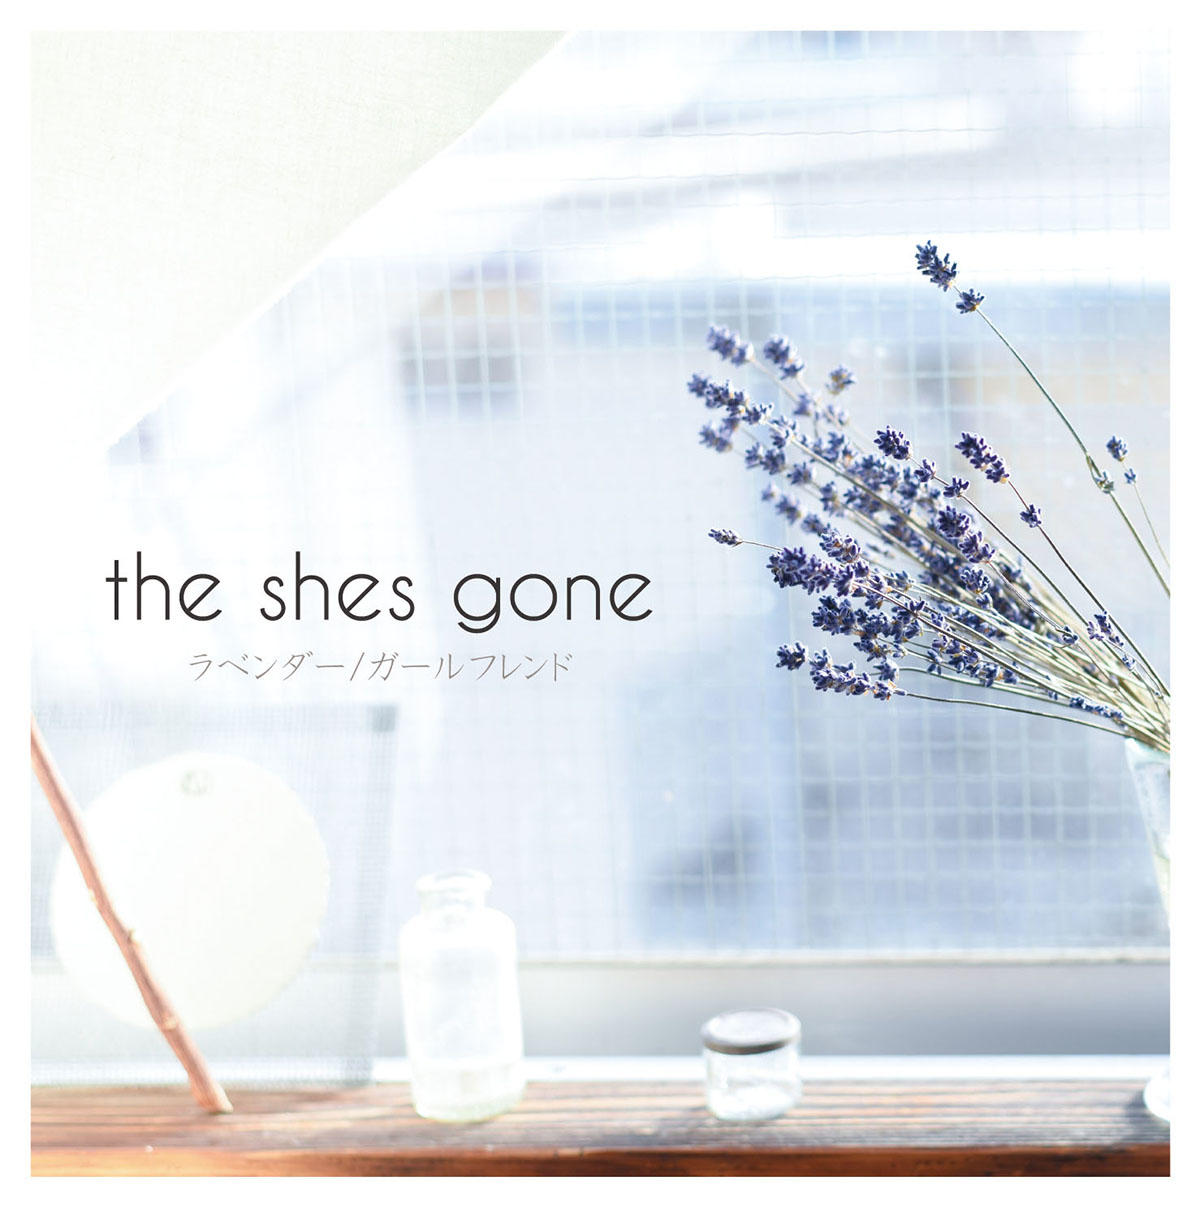 lavender_L_shesgone.jpg